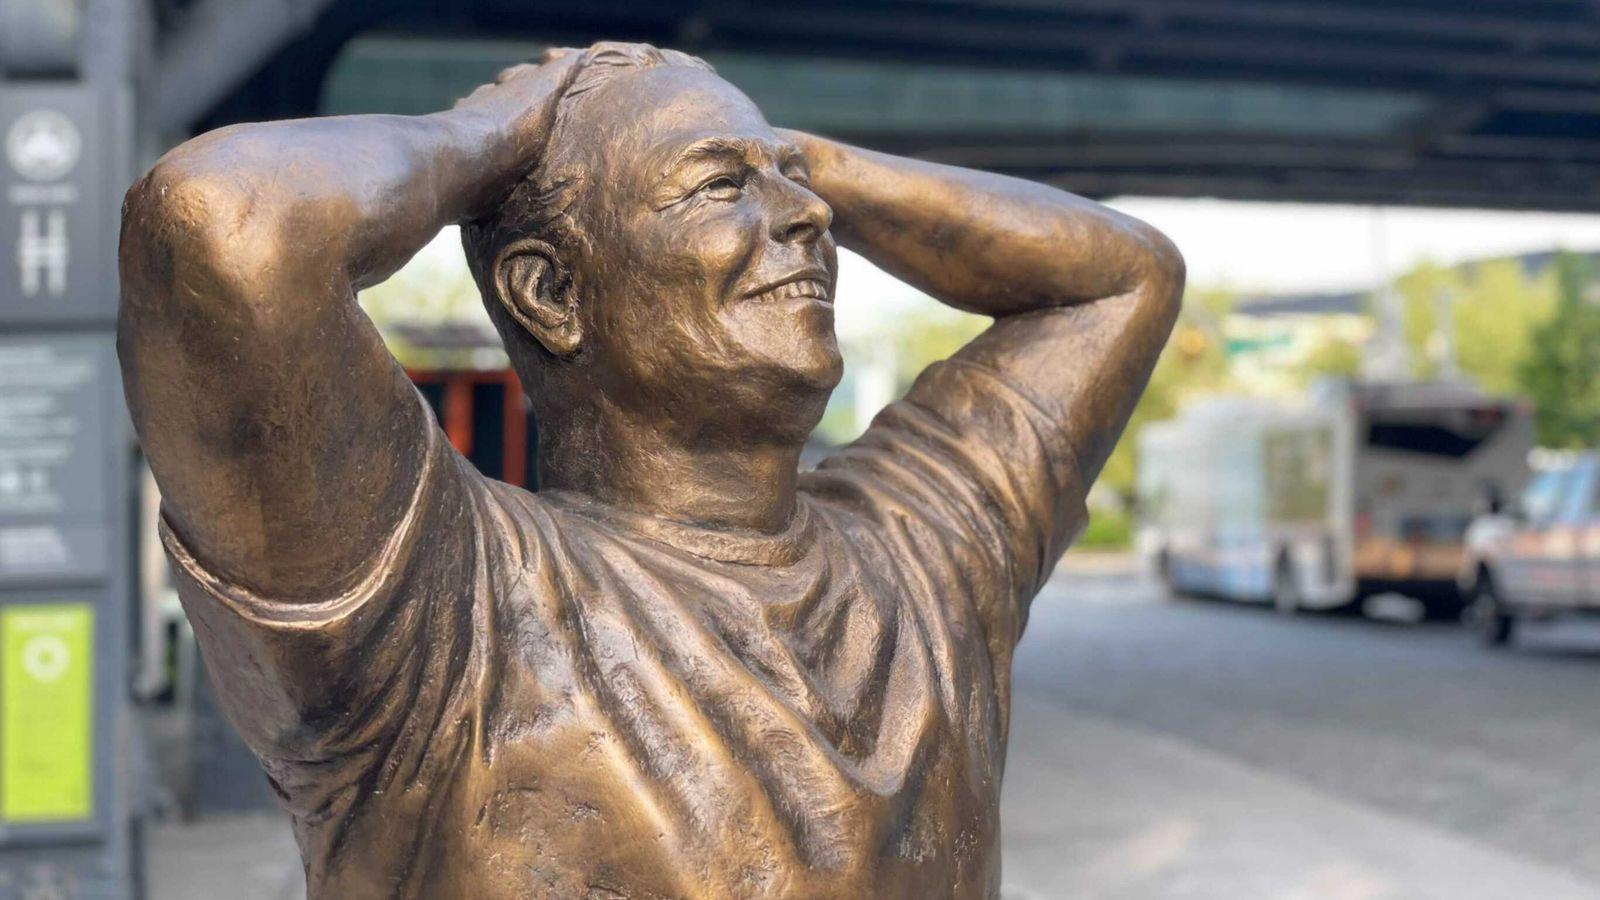 Elon Musk life-size bronze statue in Manhattan mocked online